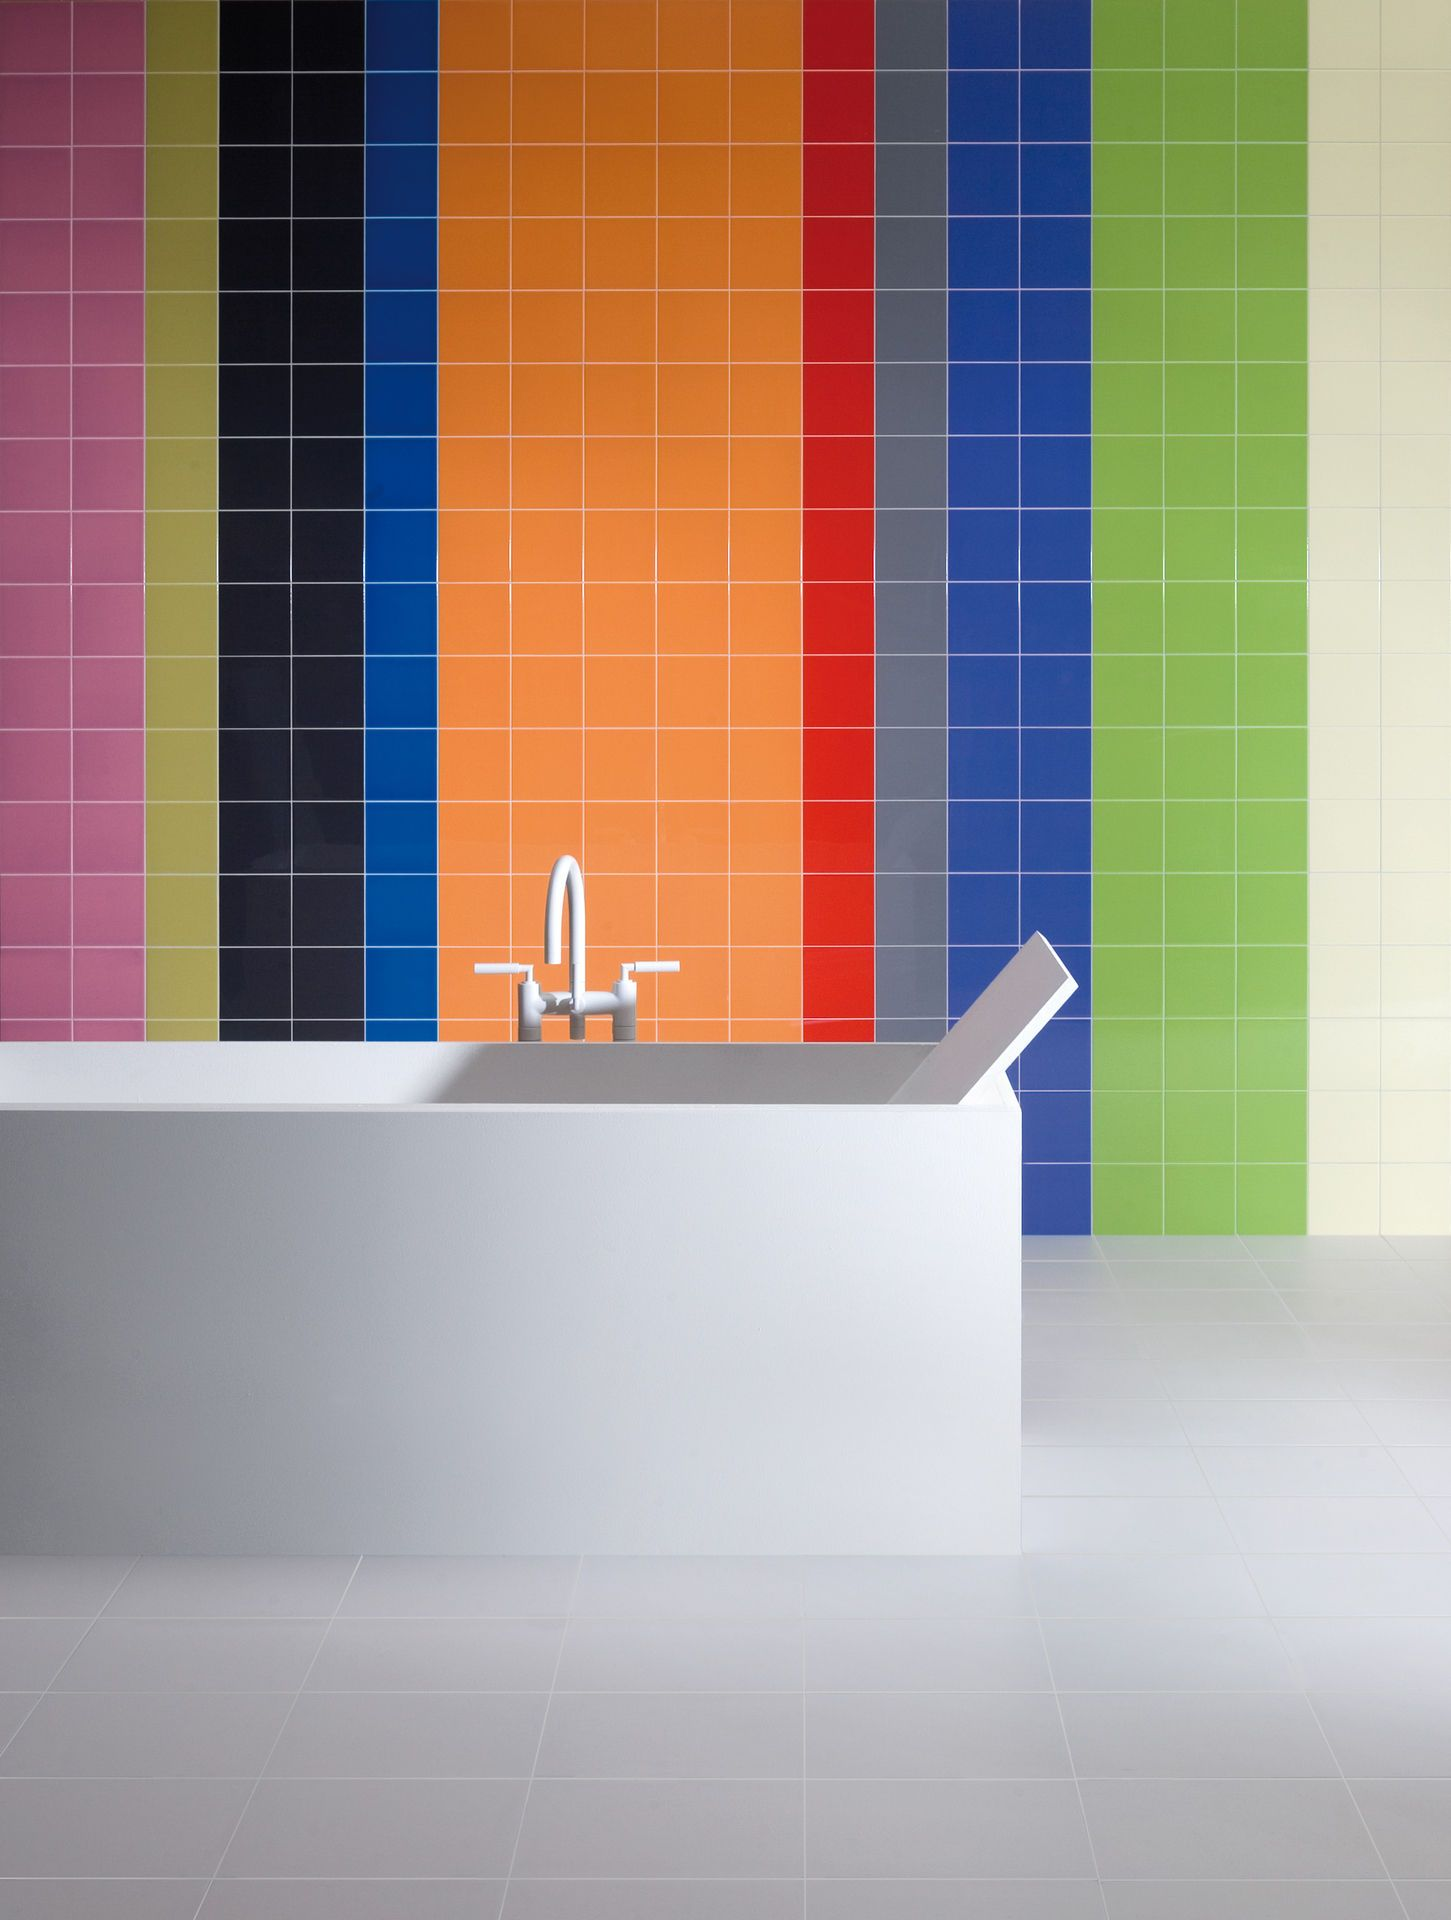 colors fliesenserie f r die wand ais. Black Bedroom Furniture Sets. Home Design Ideas